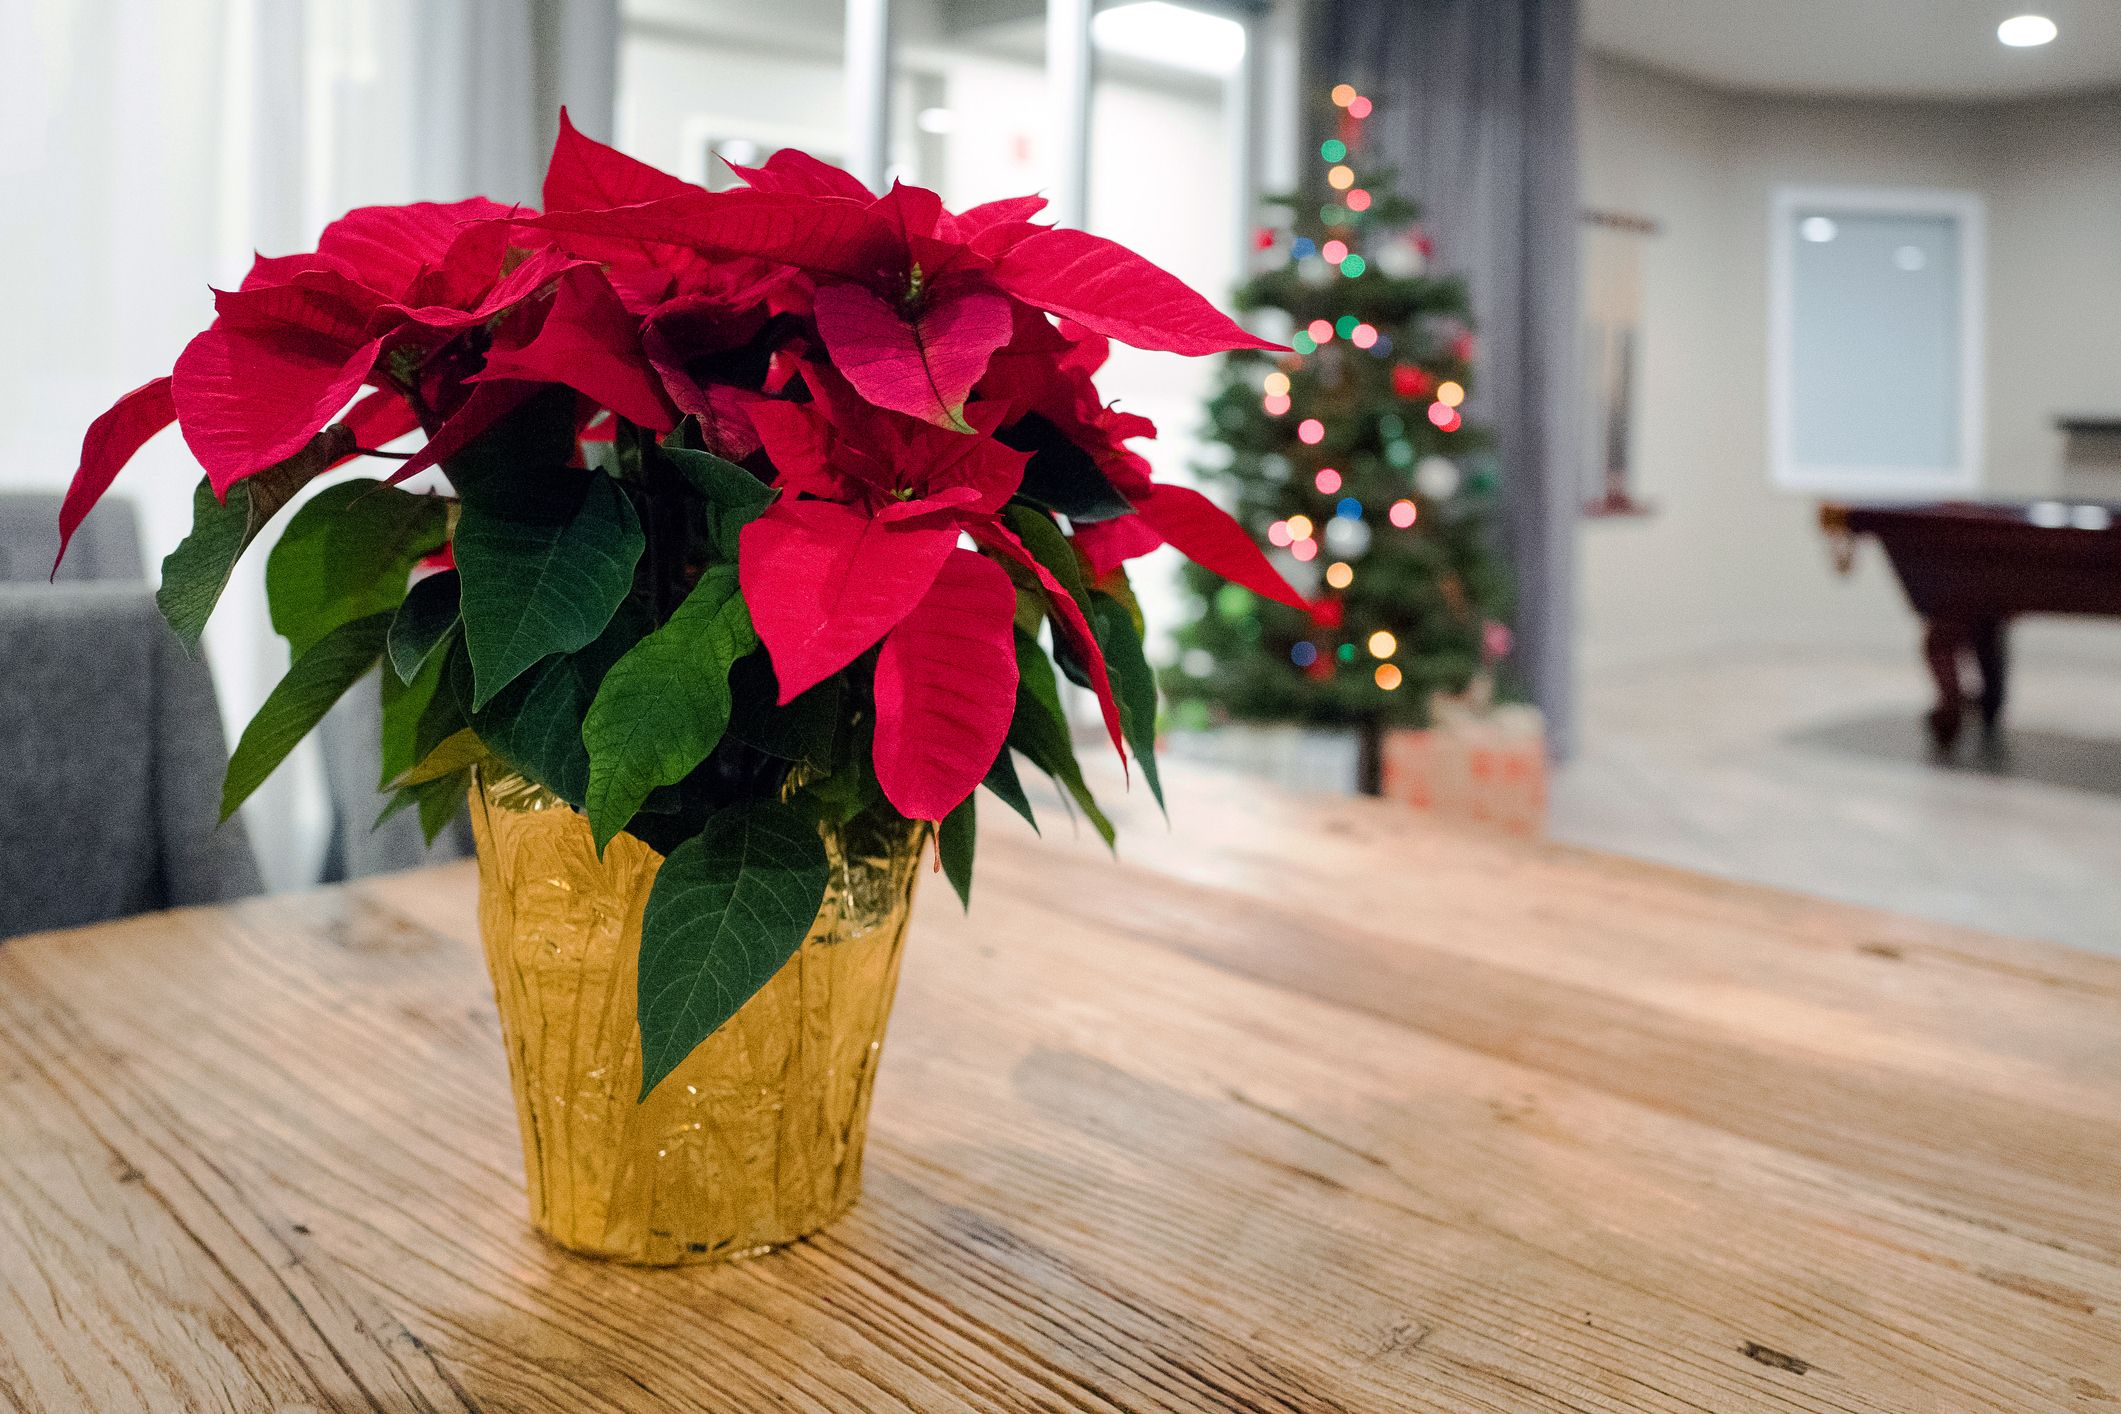 Poinsettia Care Tips For Long Lasting Poinsettias